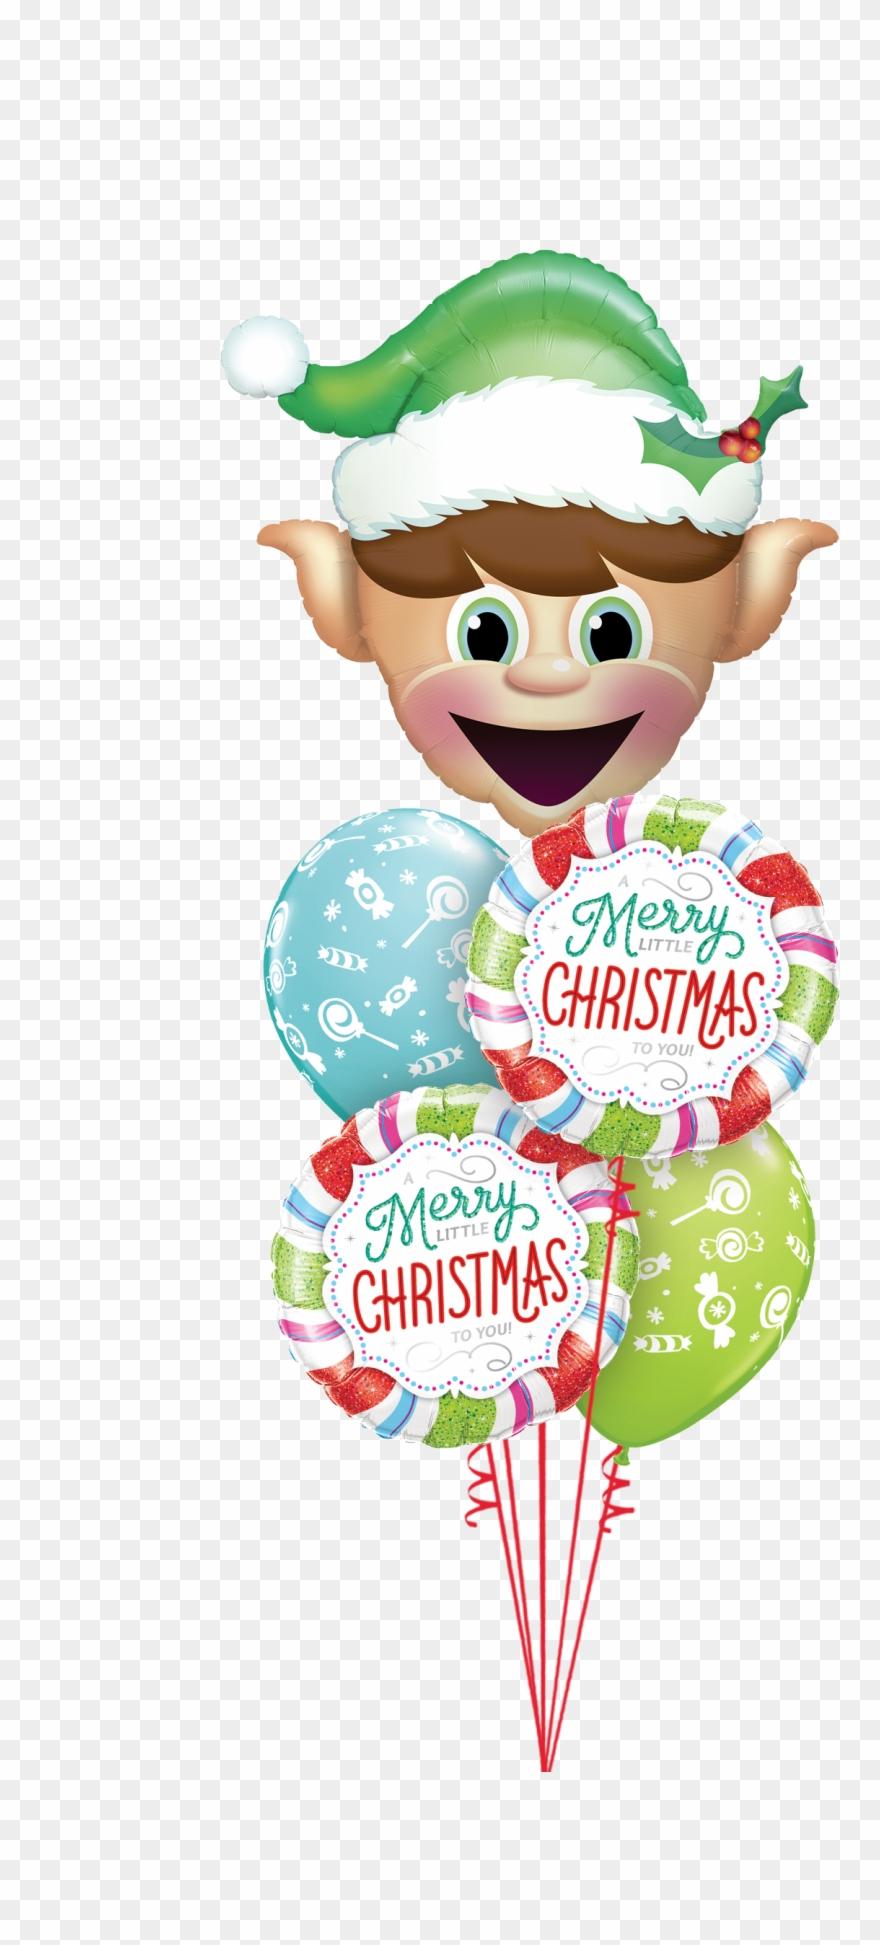 Christmas Balloons Merry Little Christmas To You Balloon